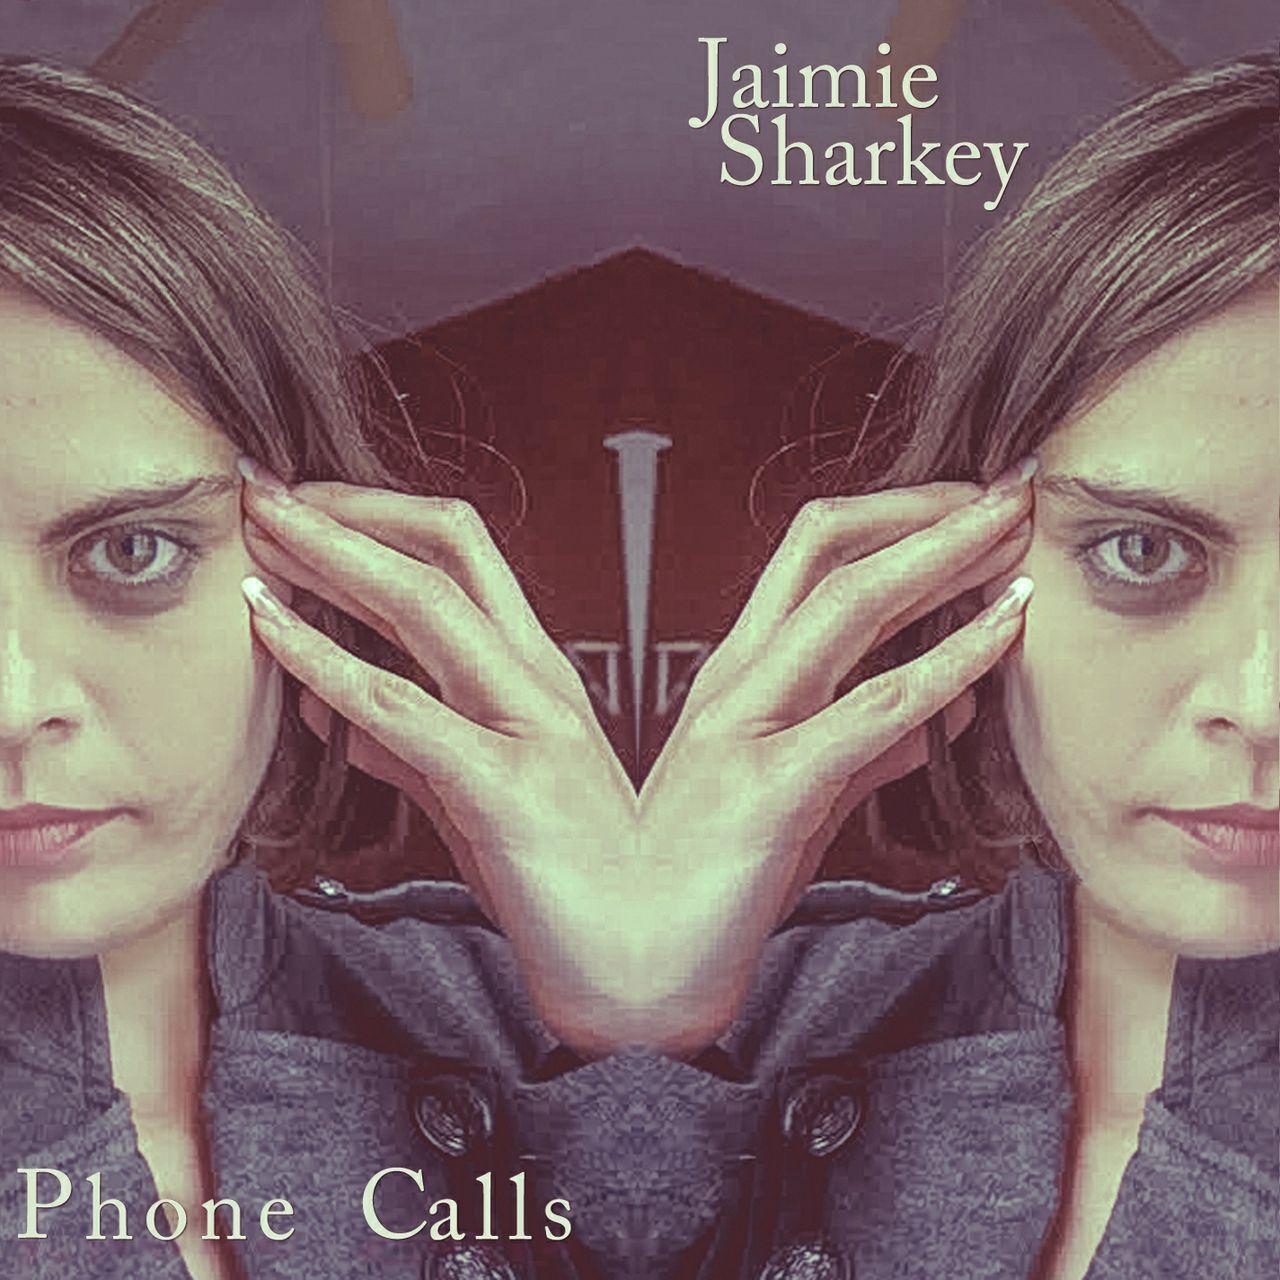 KWT 021. JAIMIE SHARKEY. Phone Calls.